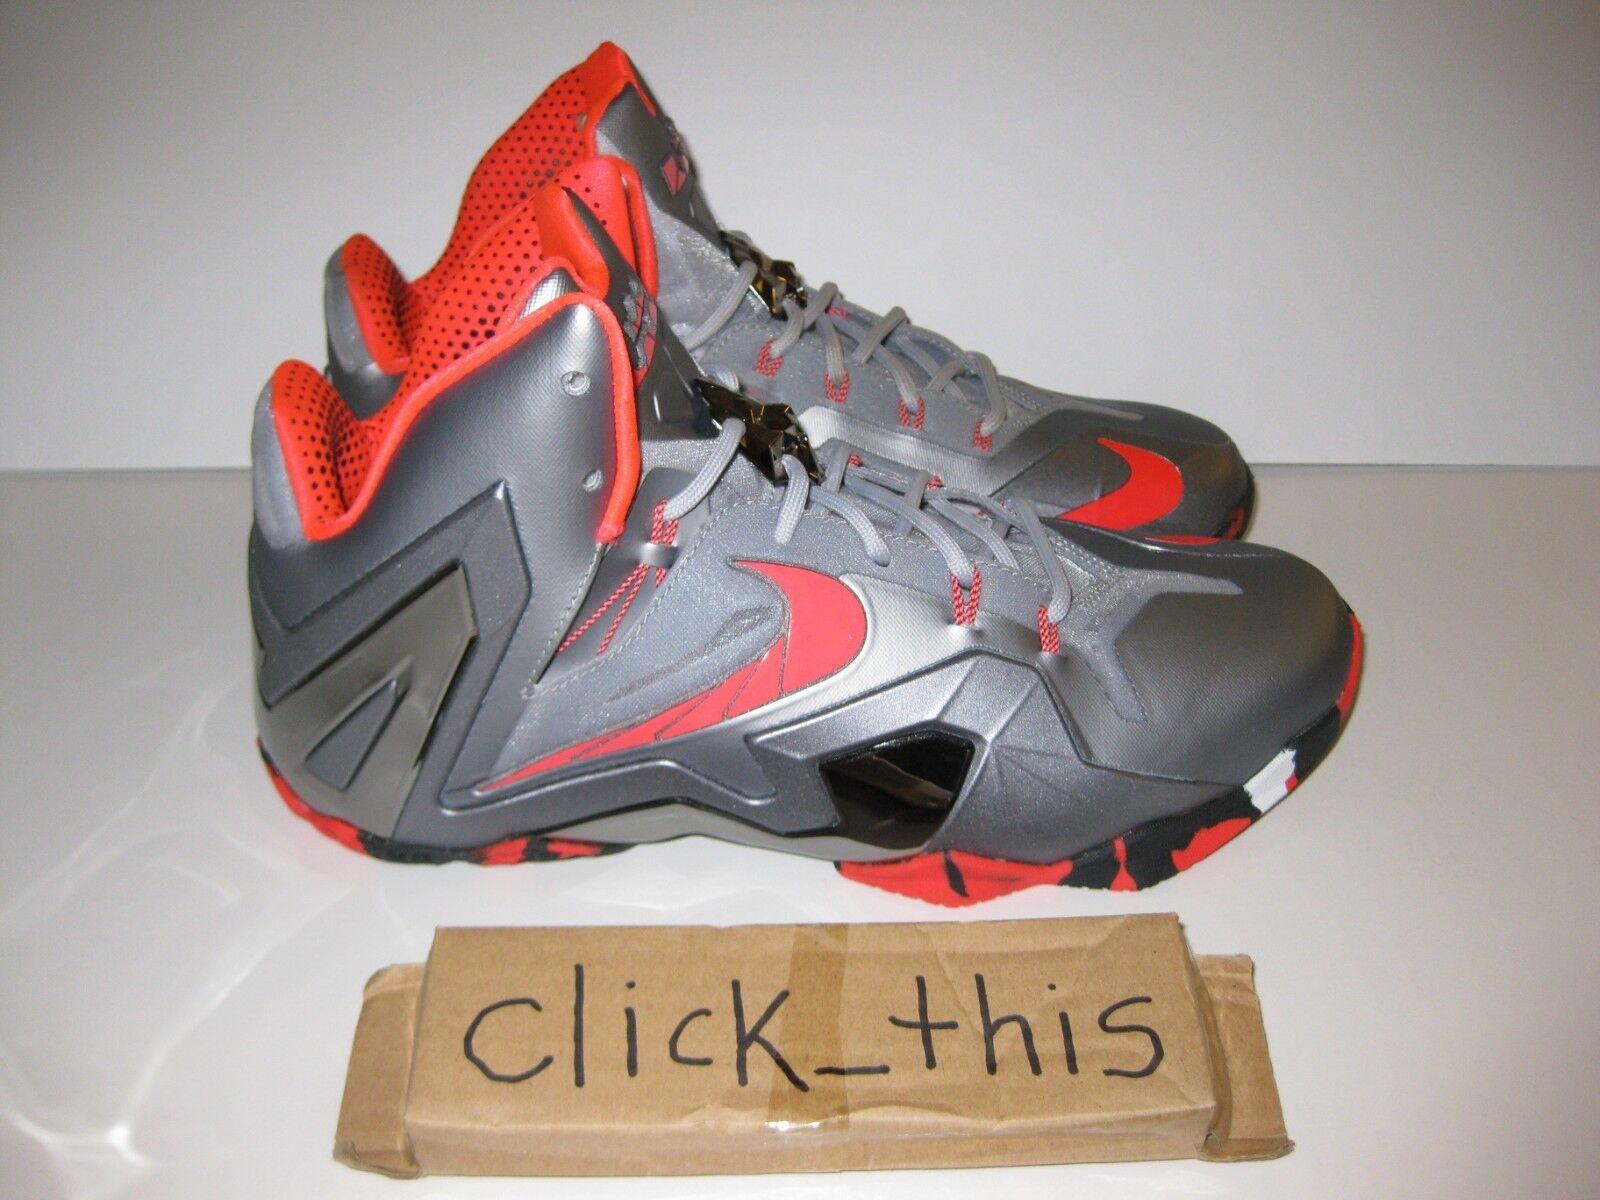 e70803761e76c Nike Lebron XI XI XI 11 Elite TEAM Wolf Grey Laser Crimson Black sz 10  642846-001 c6931a